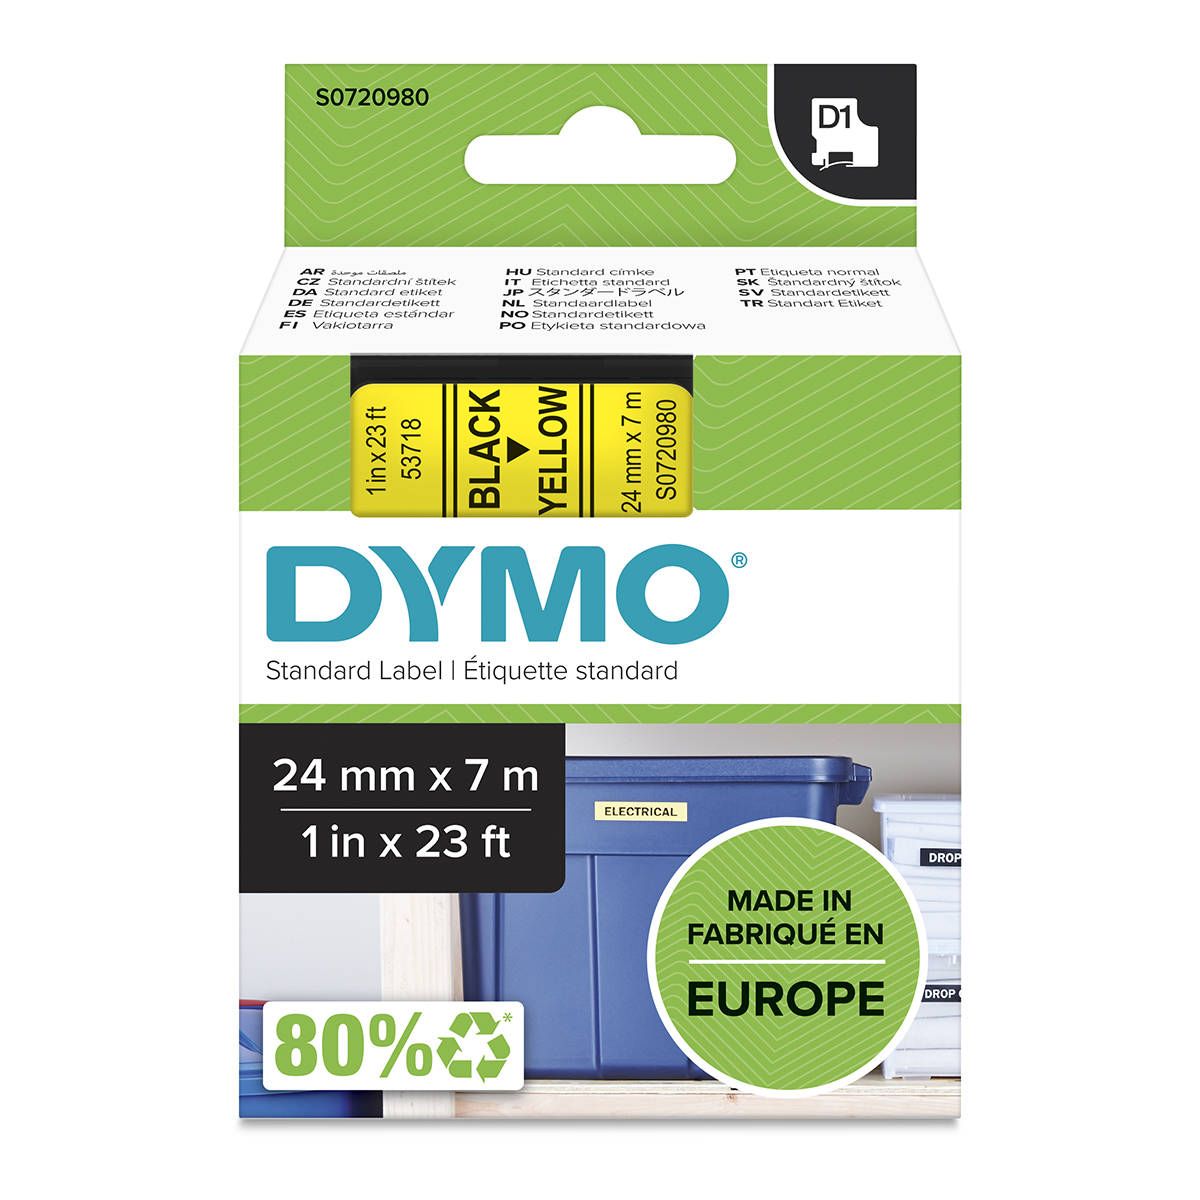 Dymo 53718 24mm x 7m Black on Yellow Tape